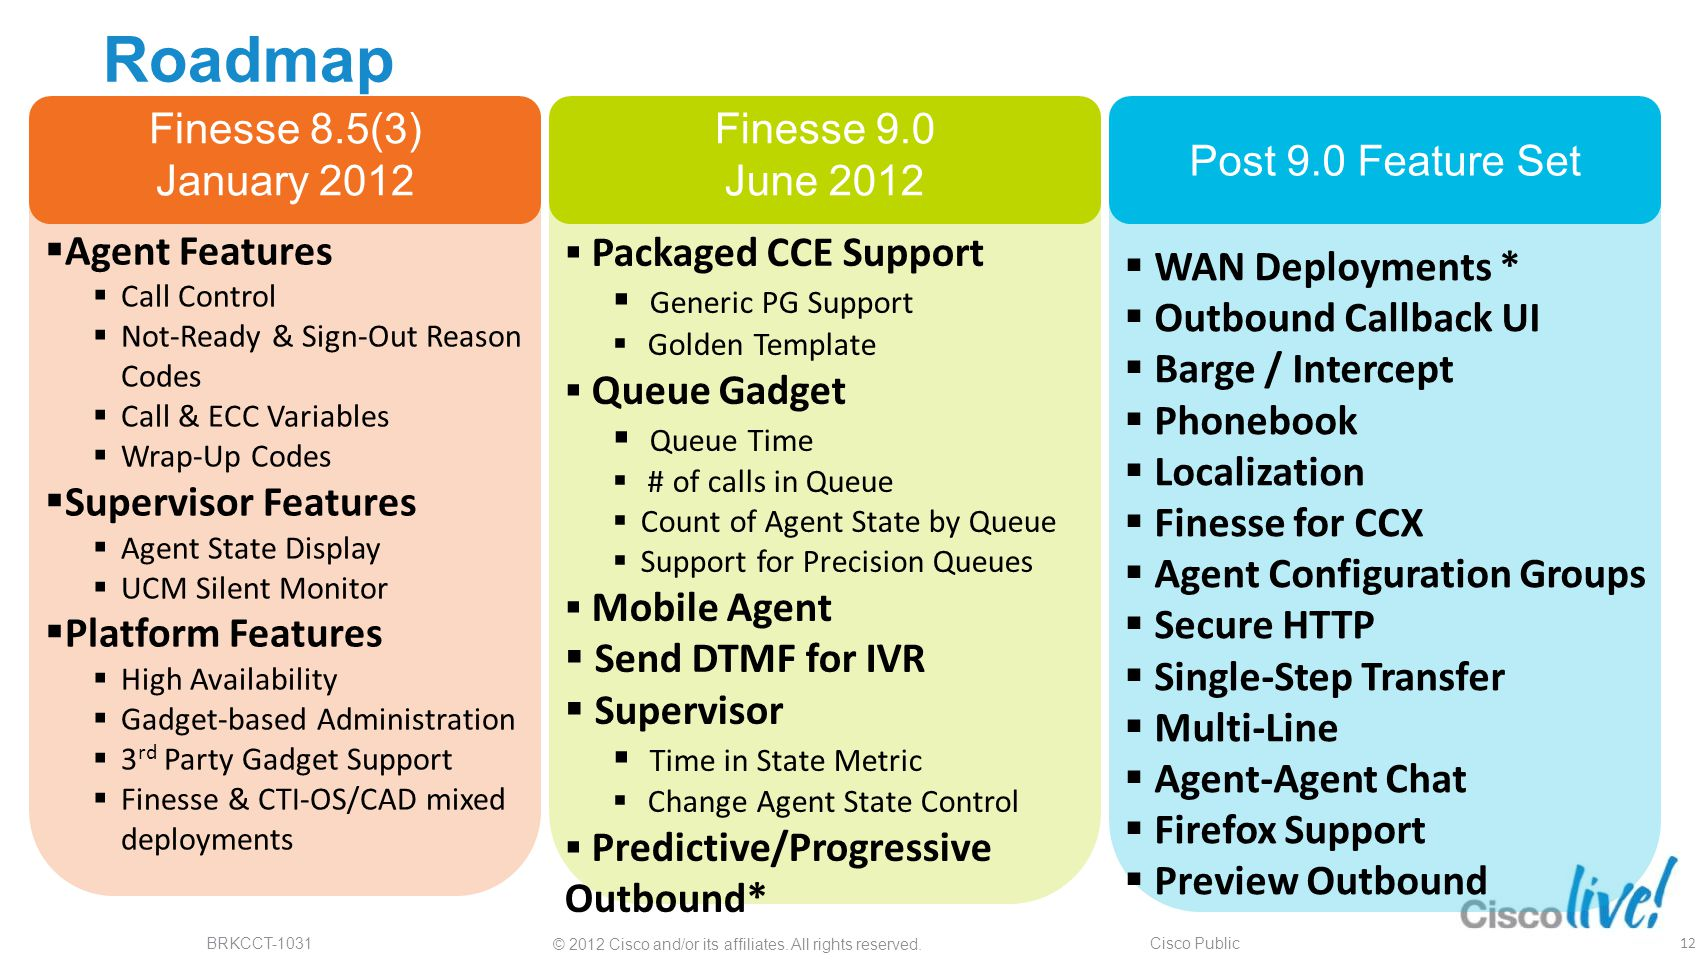 Roadmap Finesse 8.5(3) January 2012 Finesse 9.0 June 2012